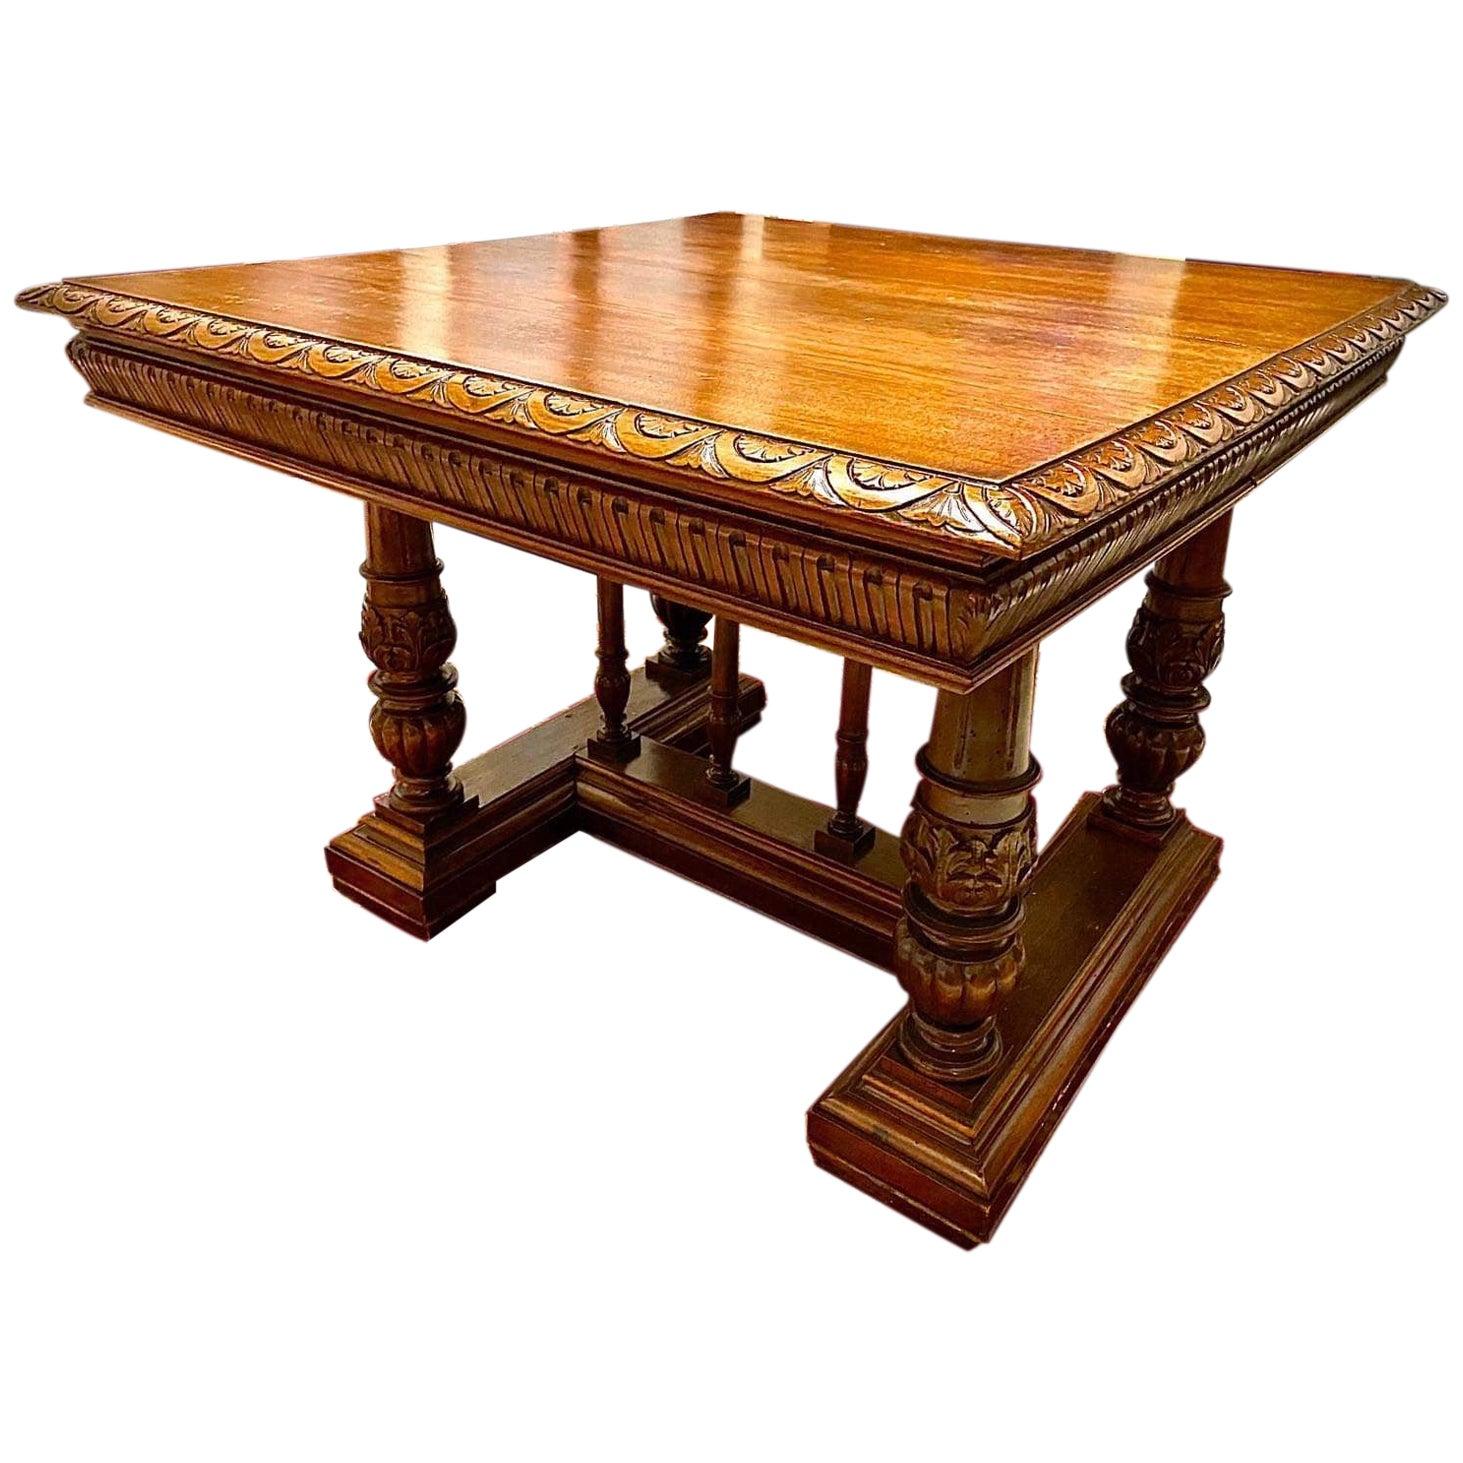 Italian Carved Walnut Wood Renaissance Style Dining Center Table, 19th Century